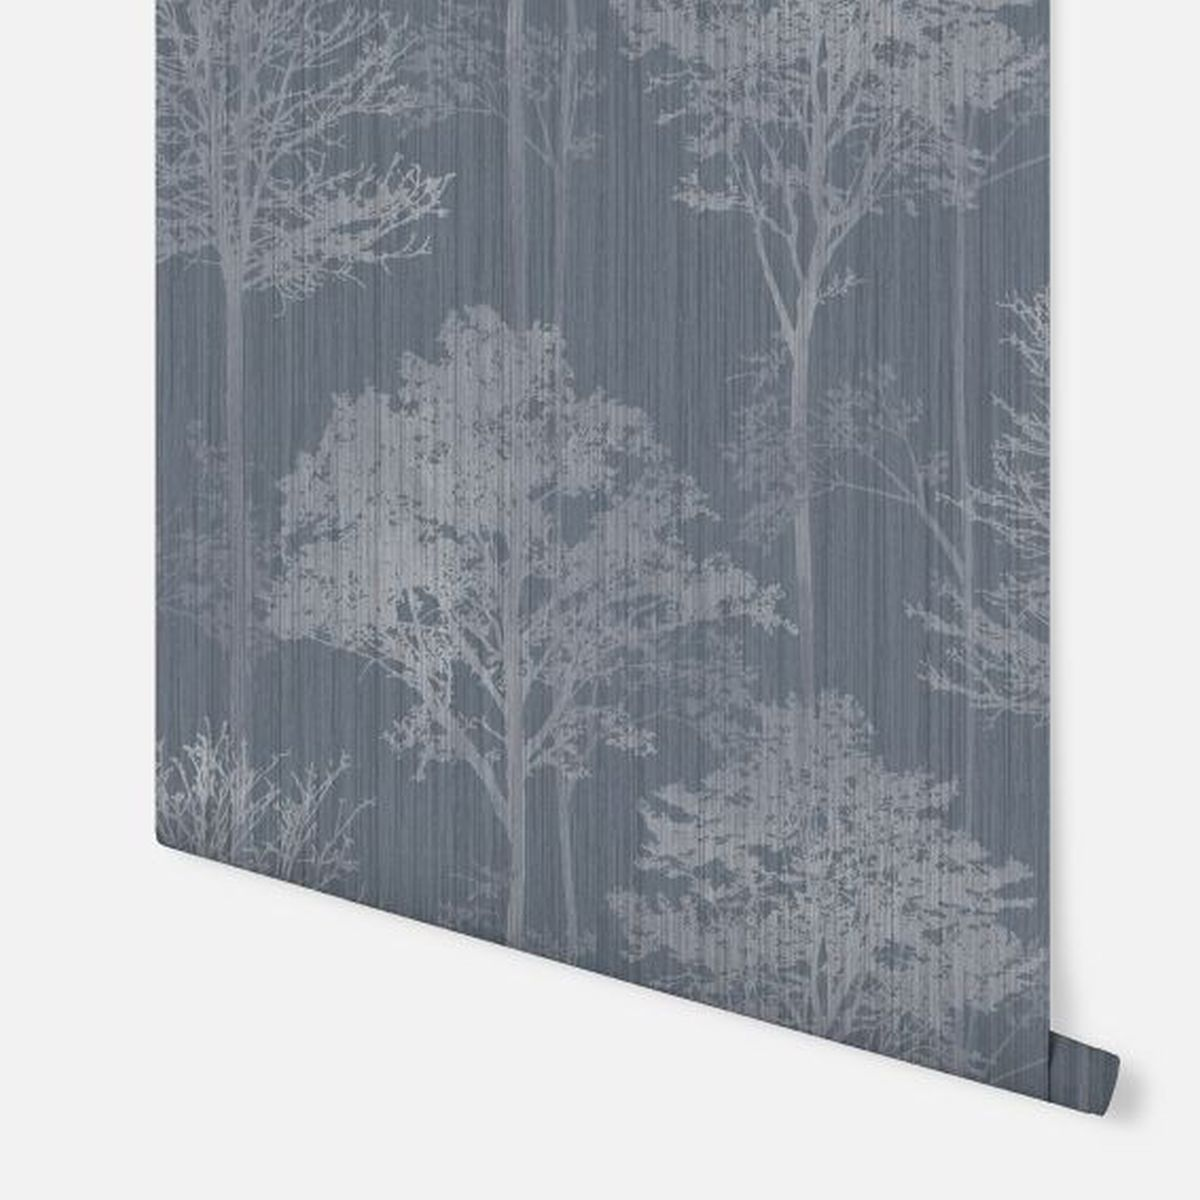 Best of Arthouse Vliestapete Qualitätsvolle Tapete 296101 Grau Blumentapete